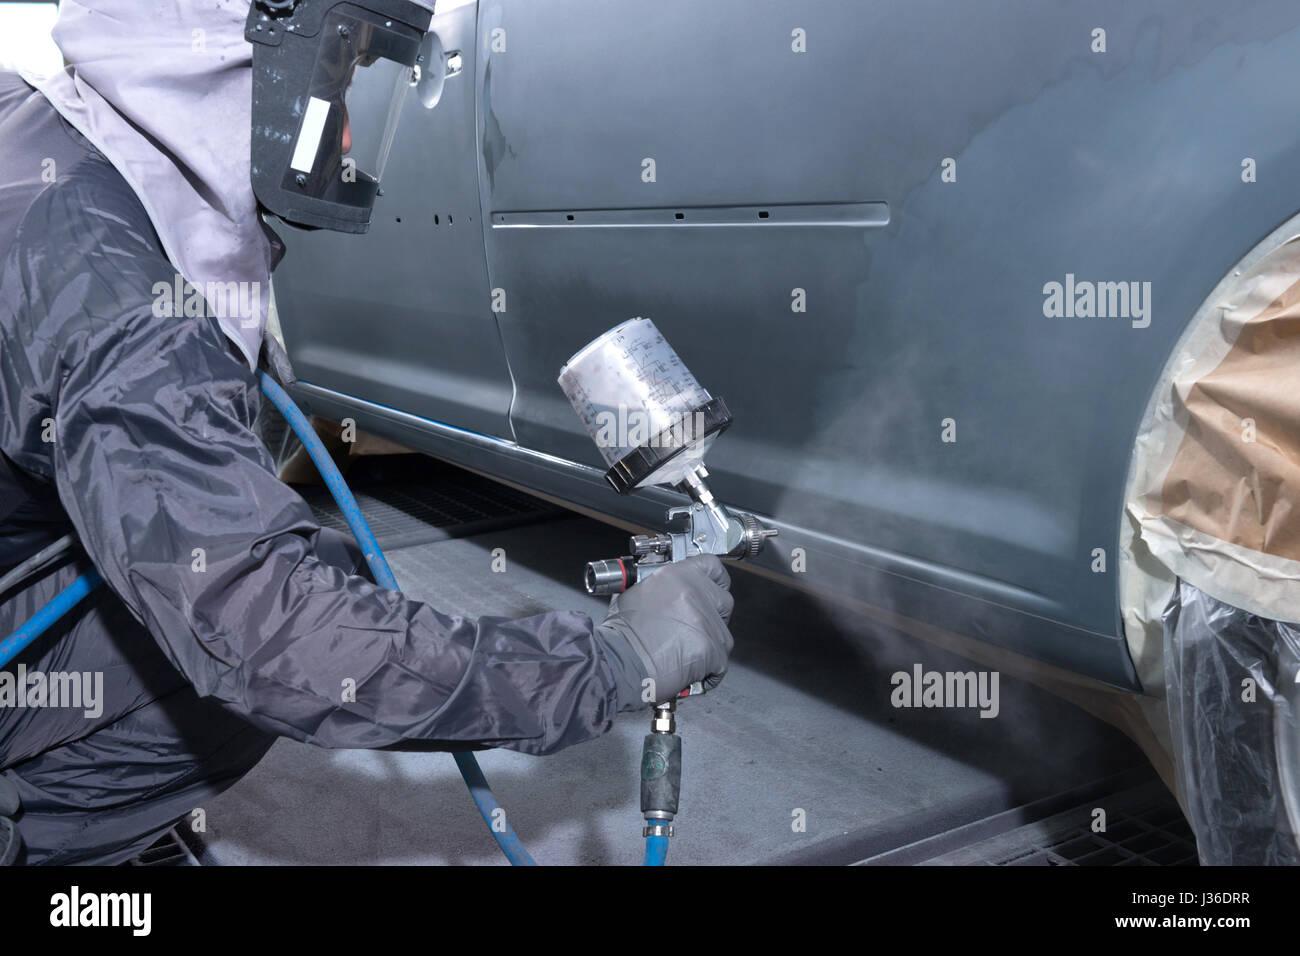 to revarnish car - Stock Image